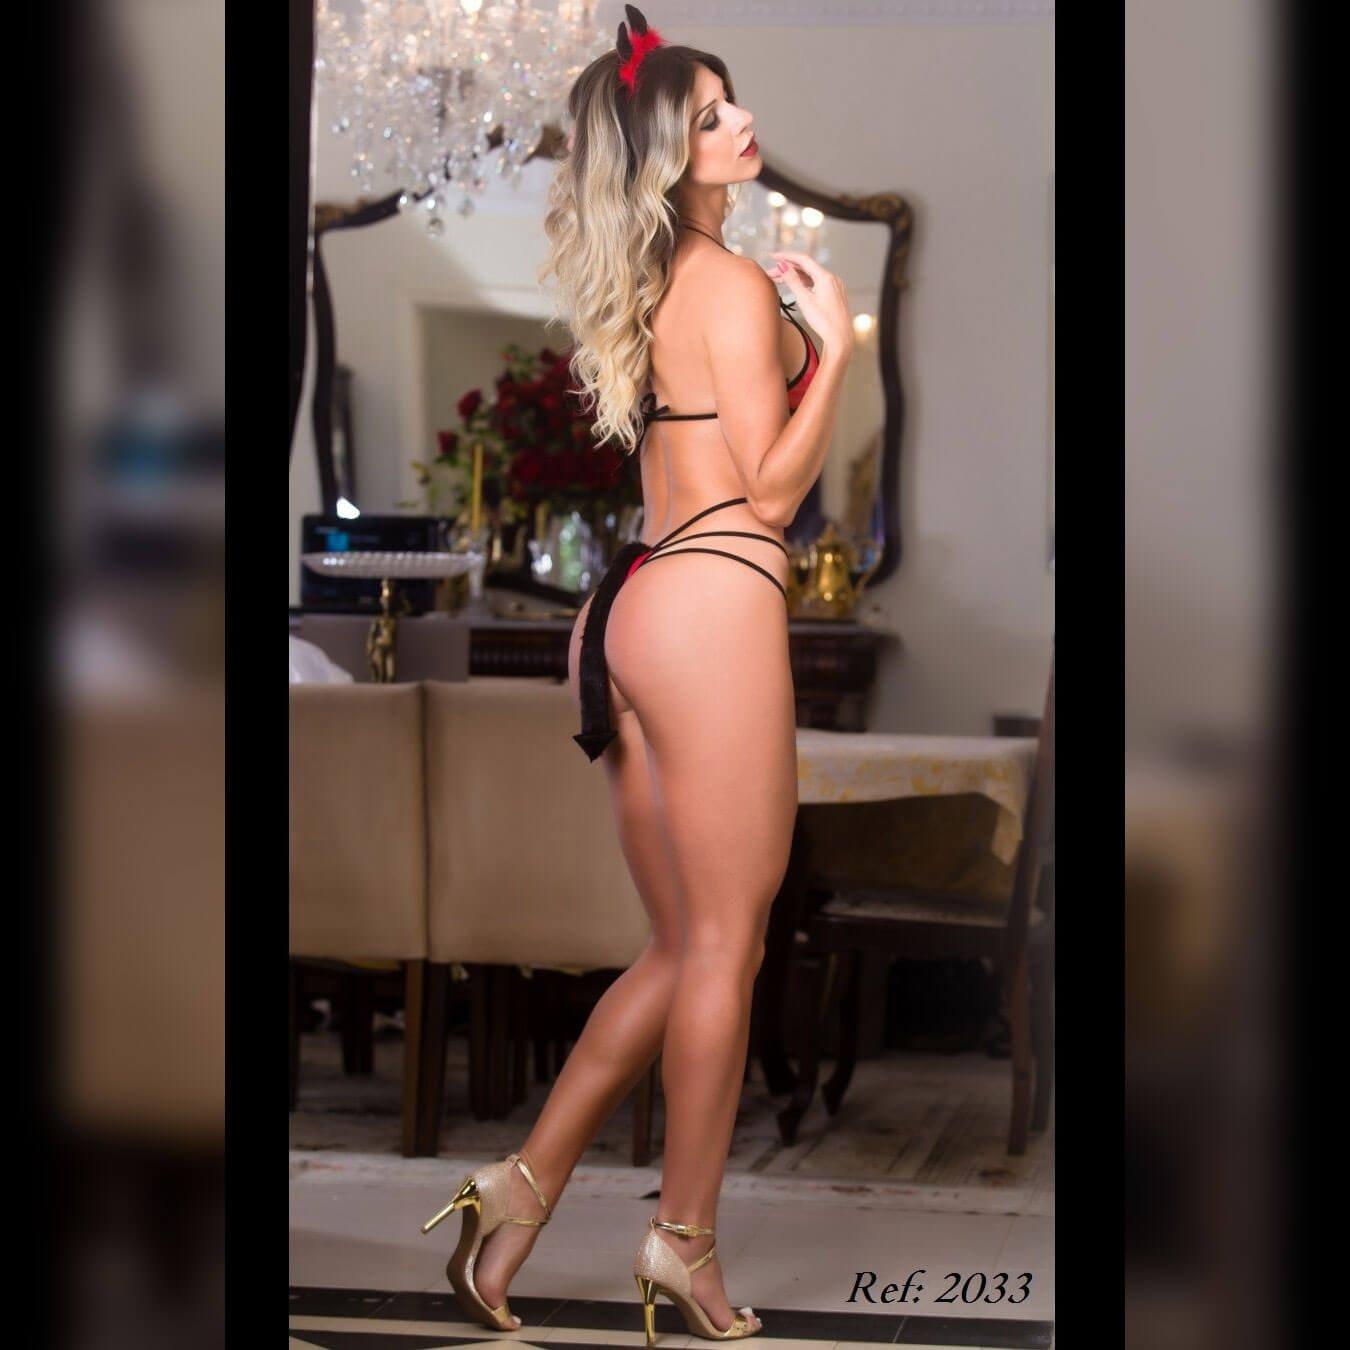 Fantasia erótica body diabinha - Garota veneno  - Sex Shop Cuiaba - Sexshop - Sexyshop - Produtos Eróticos